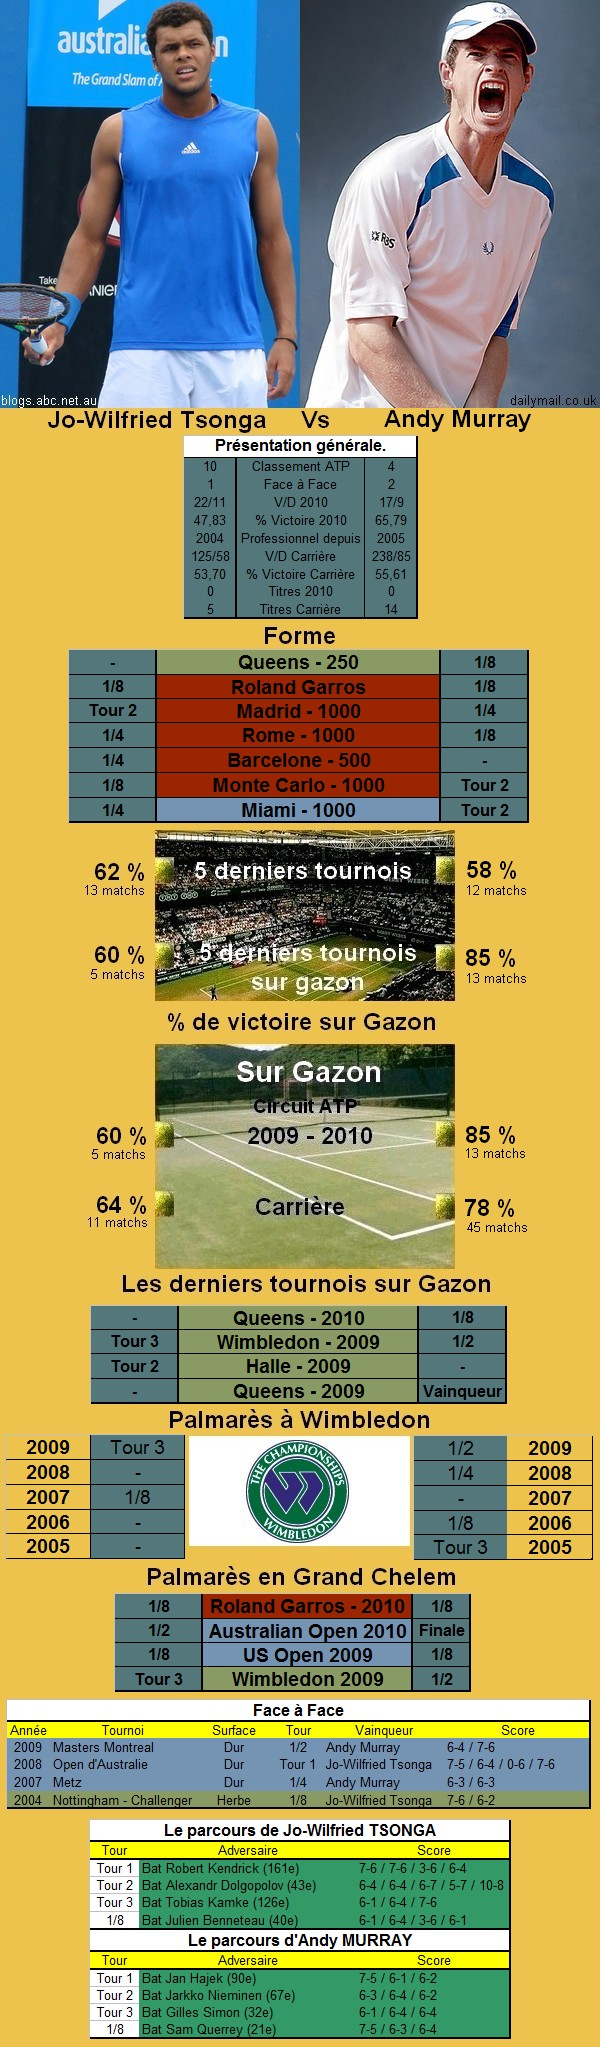 Statistiques tennis de Tsonga contre Murray à Wimbledon